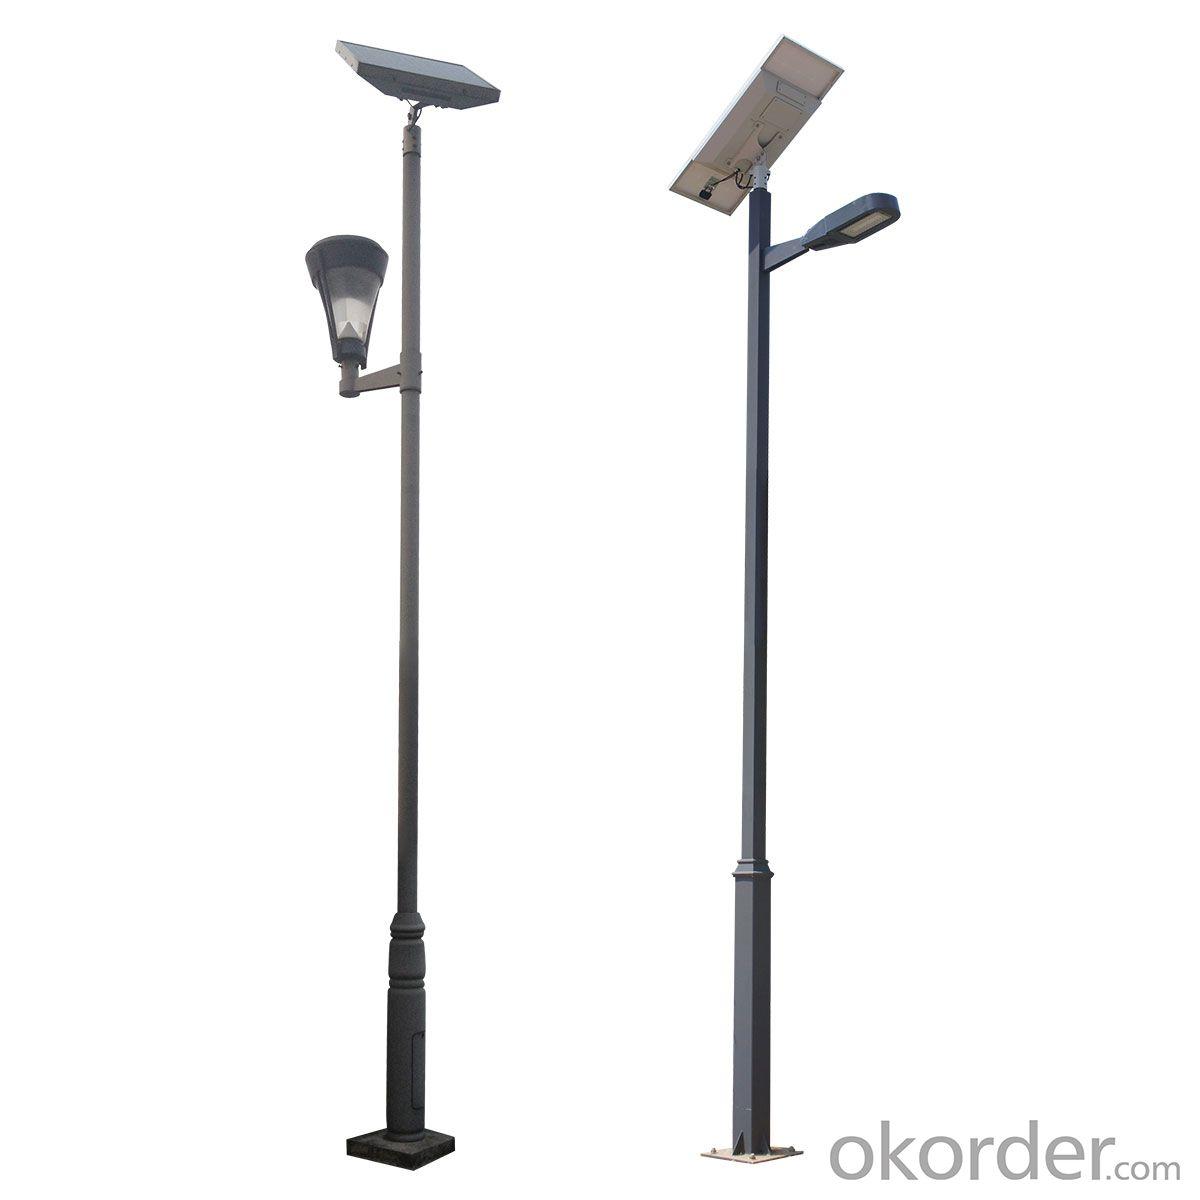 Solar street lamps solar street light environmental friendly, cost saving, 600